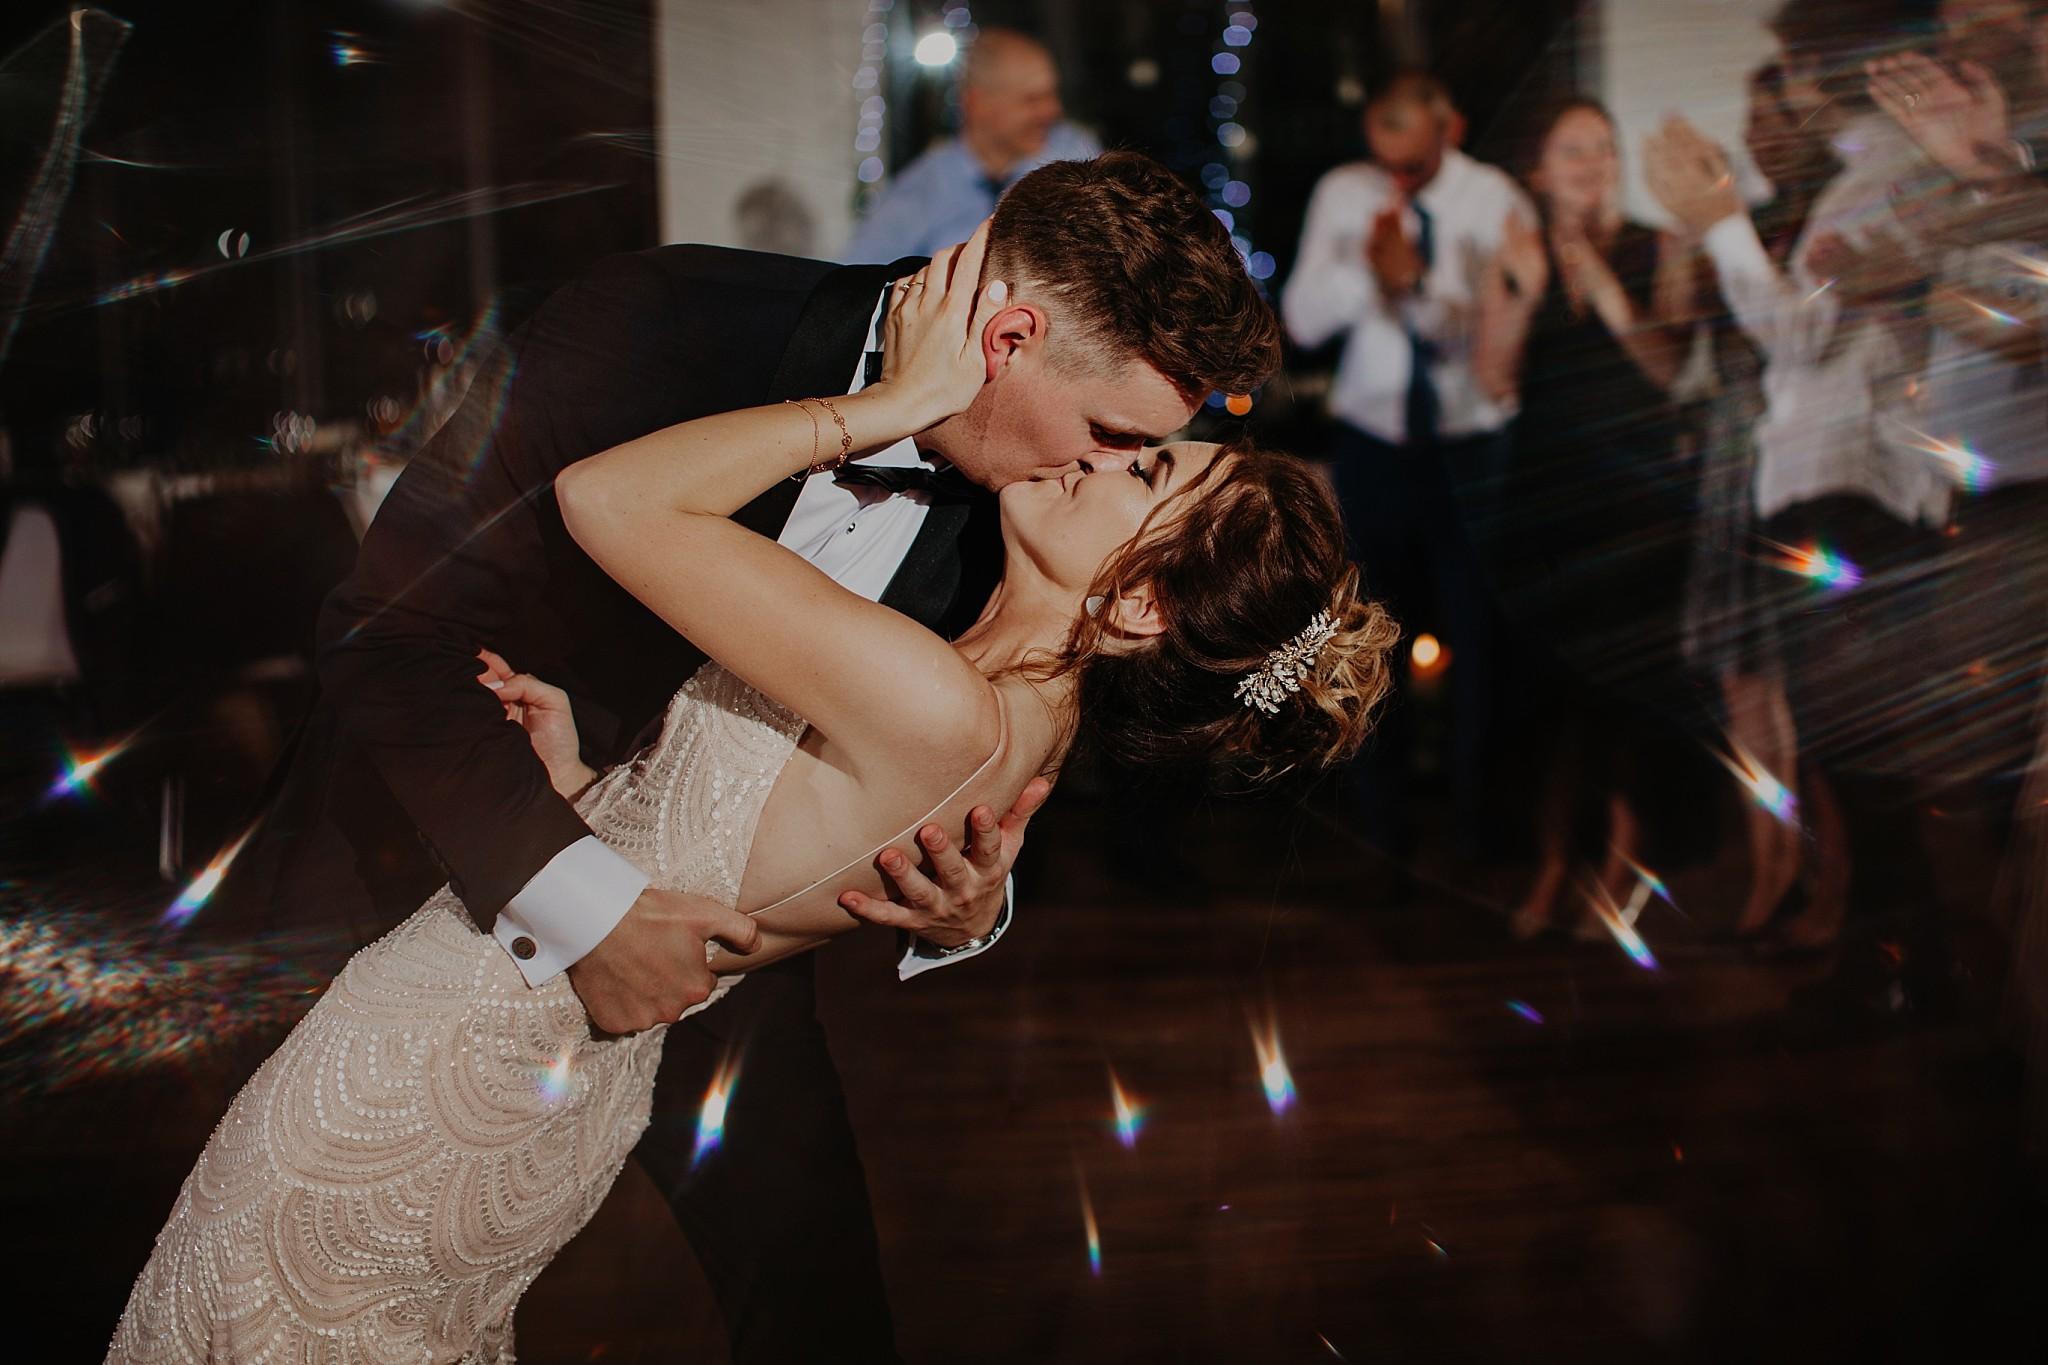 fotograf poznan wesele dobra truskawka piekne wesele pod poznaniem wesele w dobrej truskawce piekna para mloda slub marzen slub koronawirus slub listopad wesele koronawirus 467